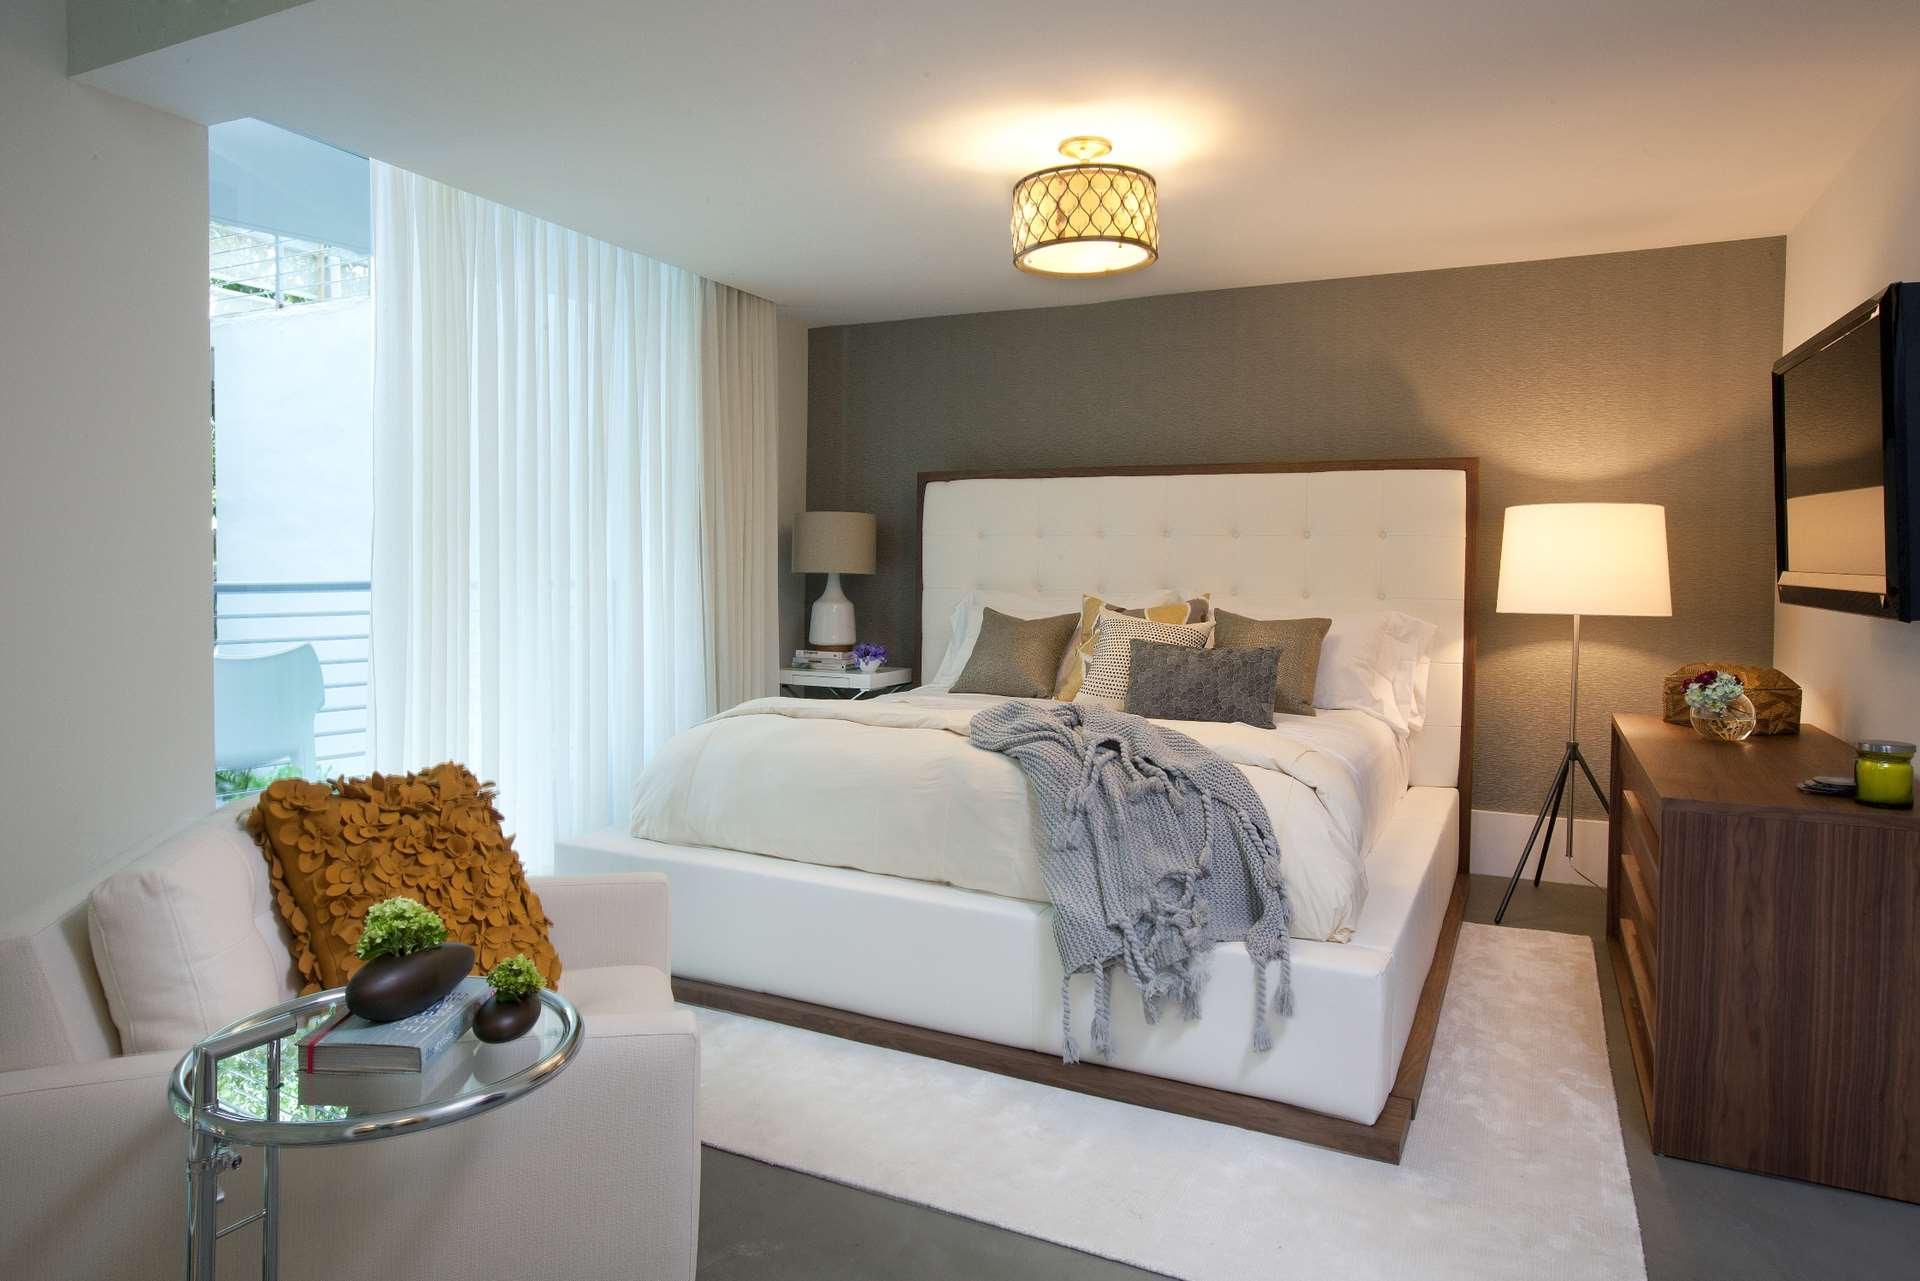 Interior Designers In South Florida Small House Interior Design